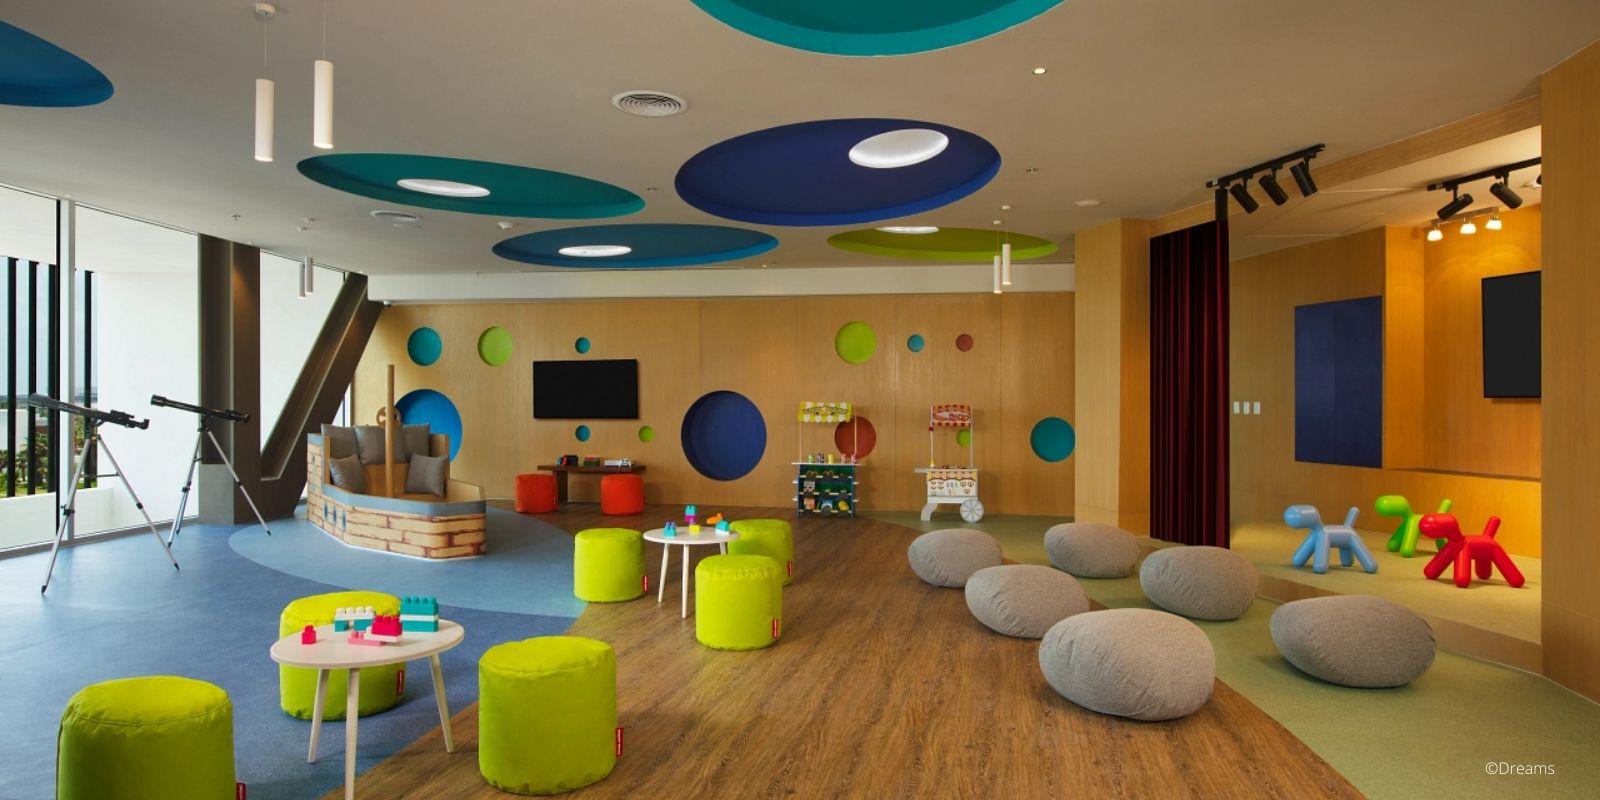 dreams-vista-cancun-golf-spa-resort- 4